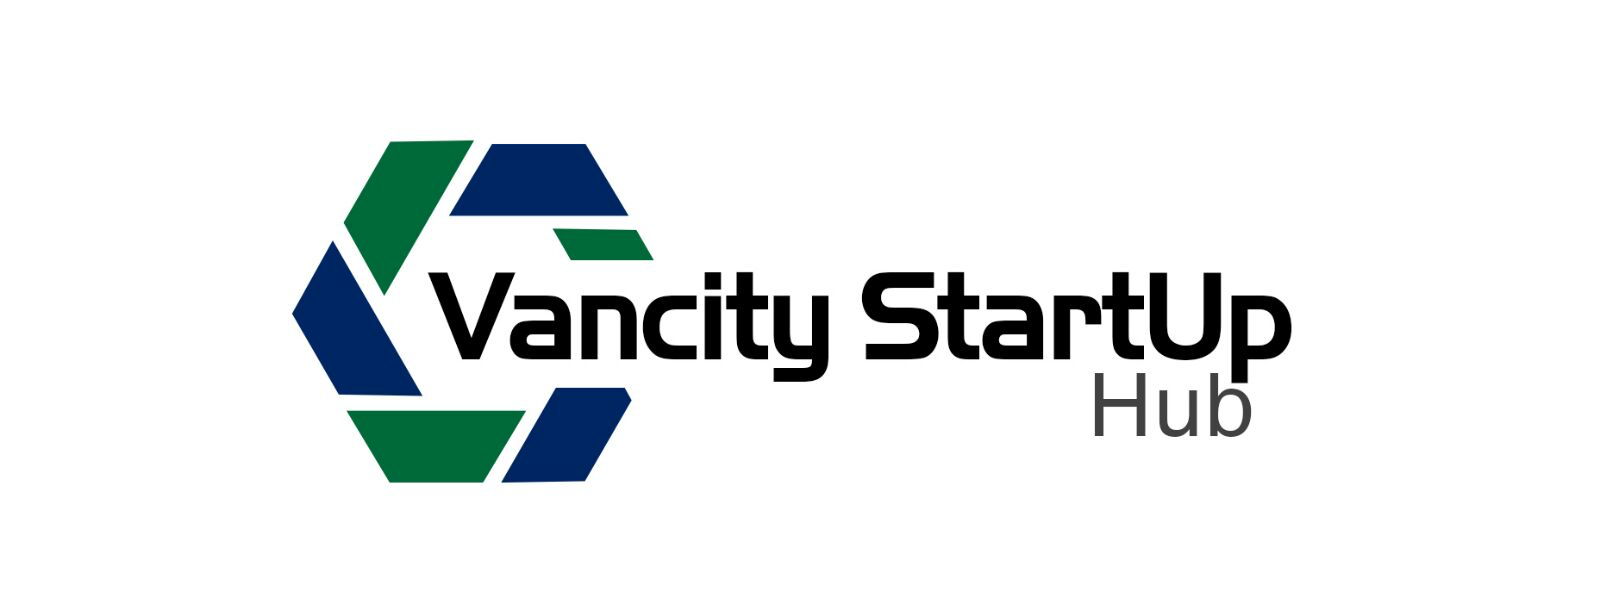 Vancity StartUp Hub logo